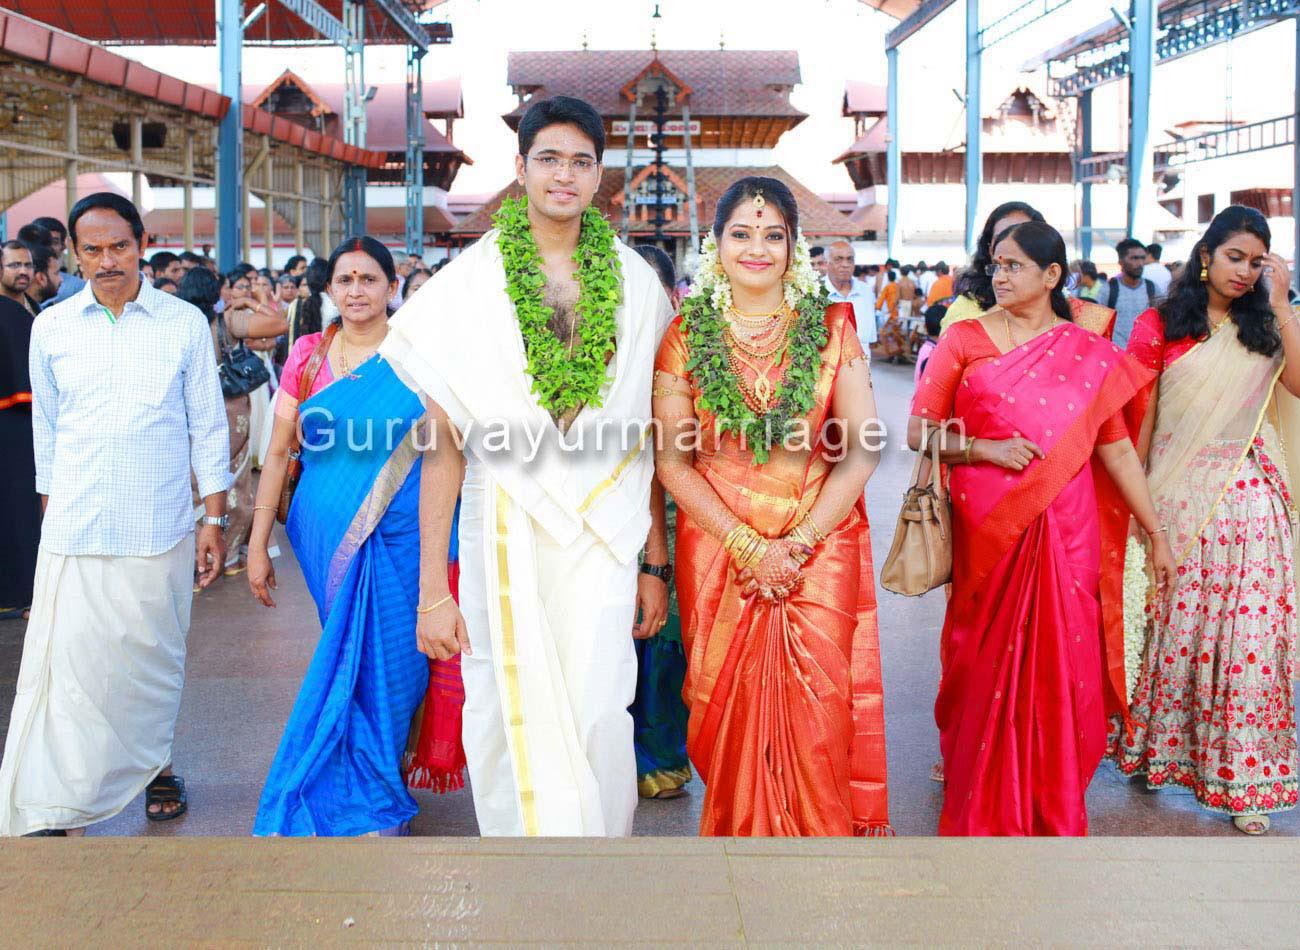 guruvayur_temple_marriage